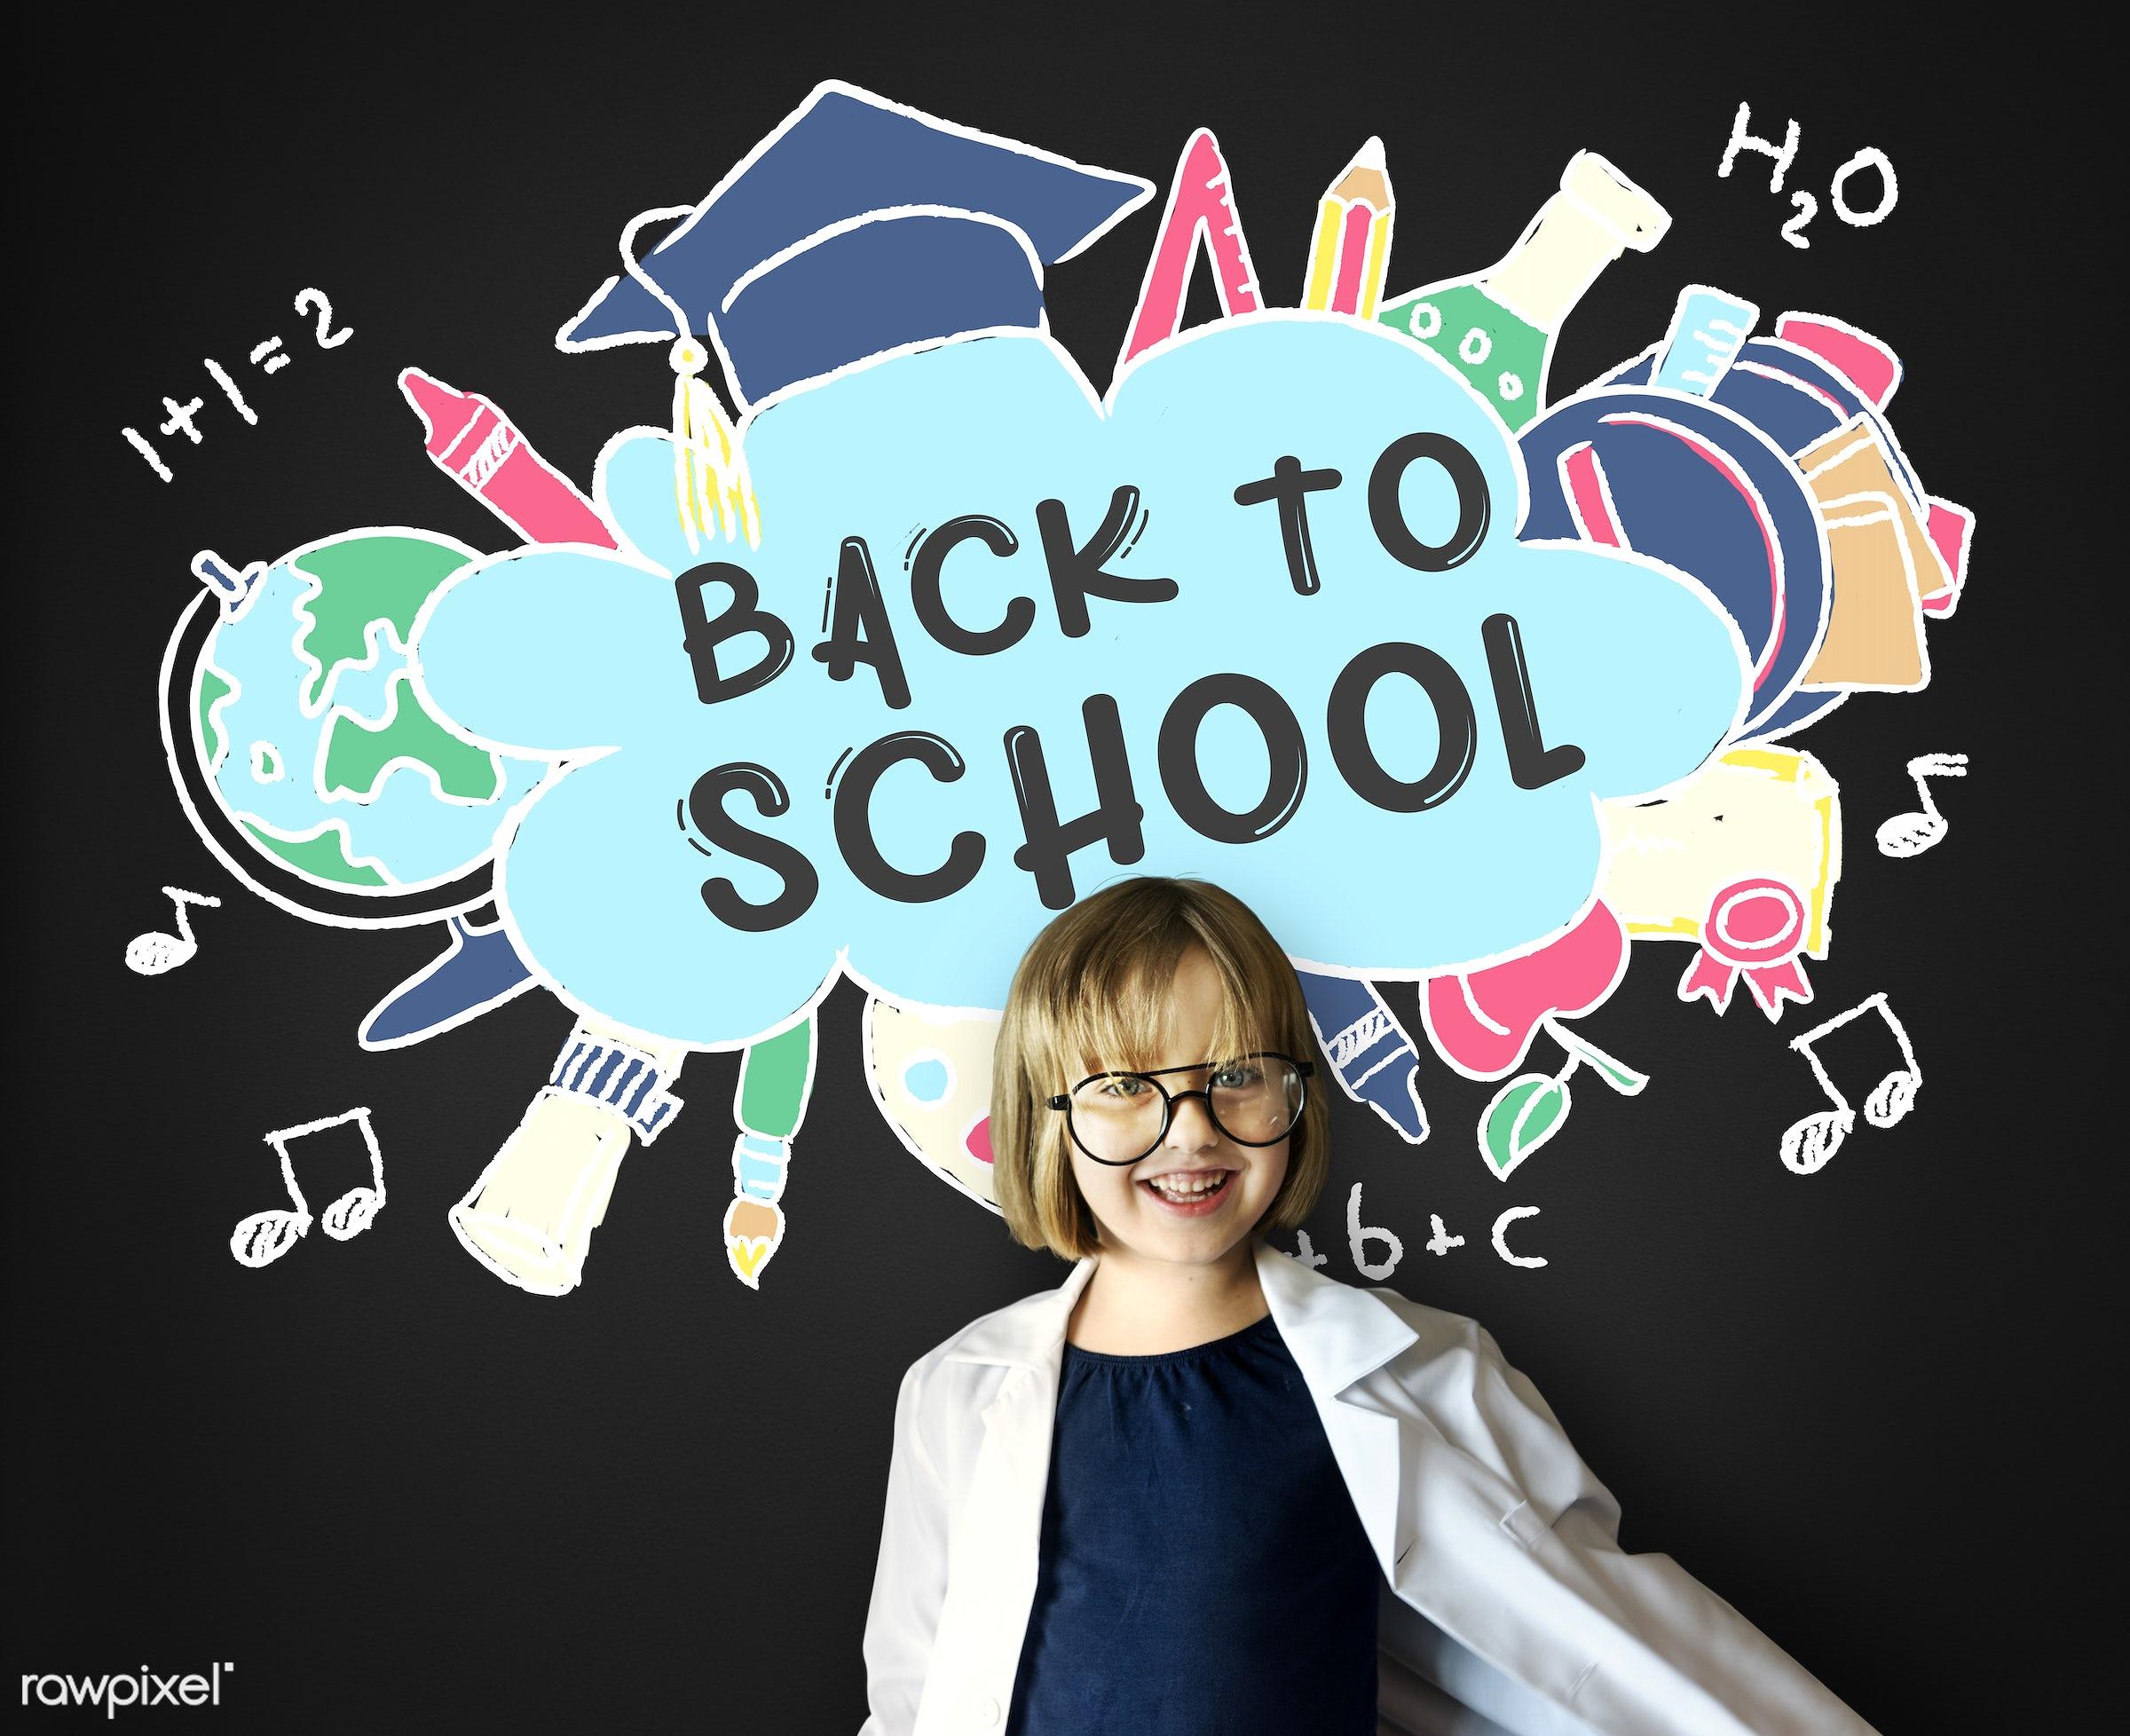 academics, adorable, back to school, blackboard, cheerful, child, childhood, college, cute, dream job, education, elementary...